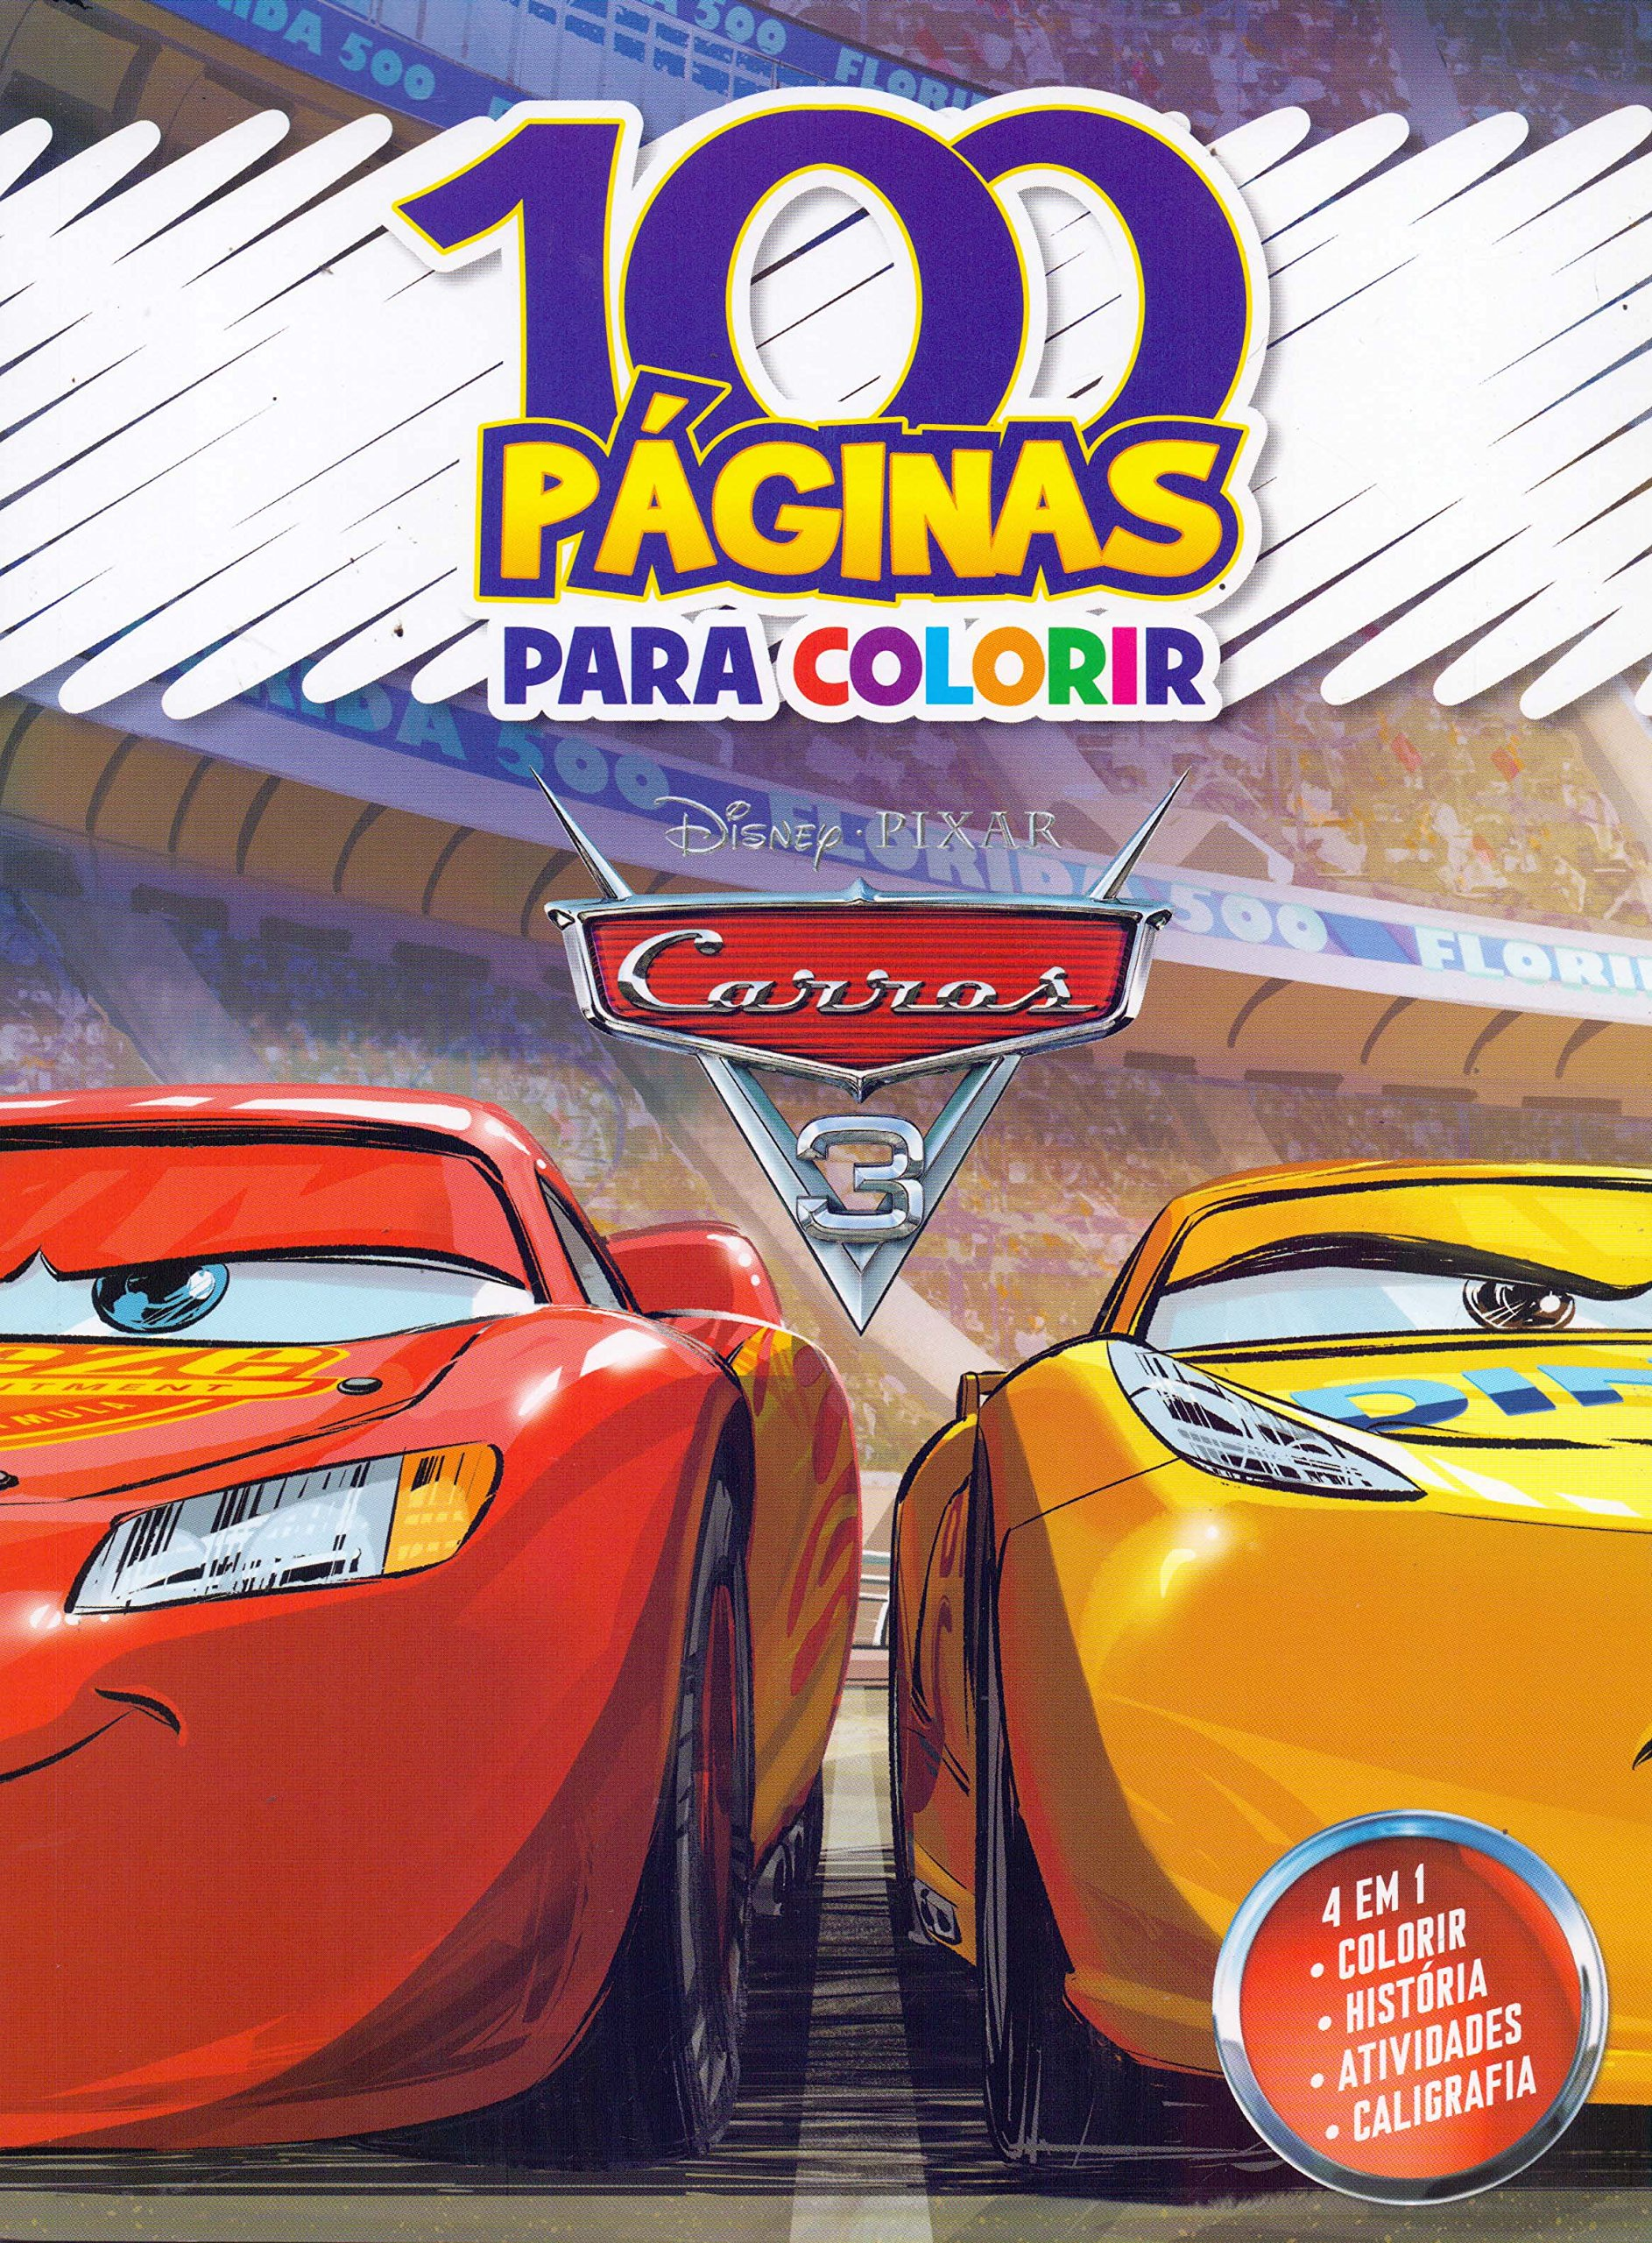 100 Paginas Para Colorir Disney Carros 3 Jefferson Ferreira